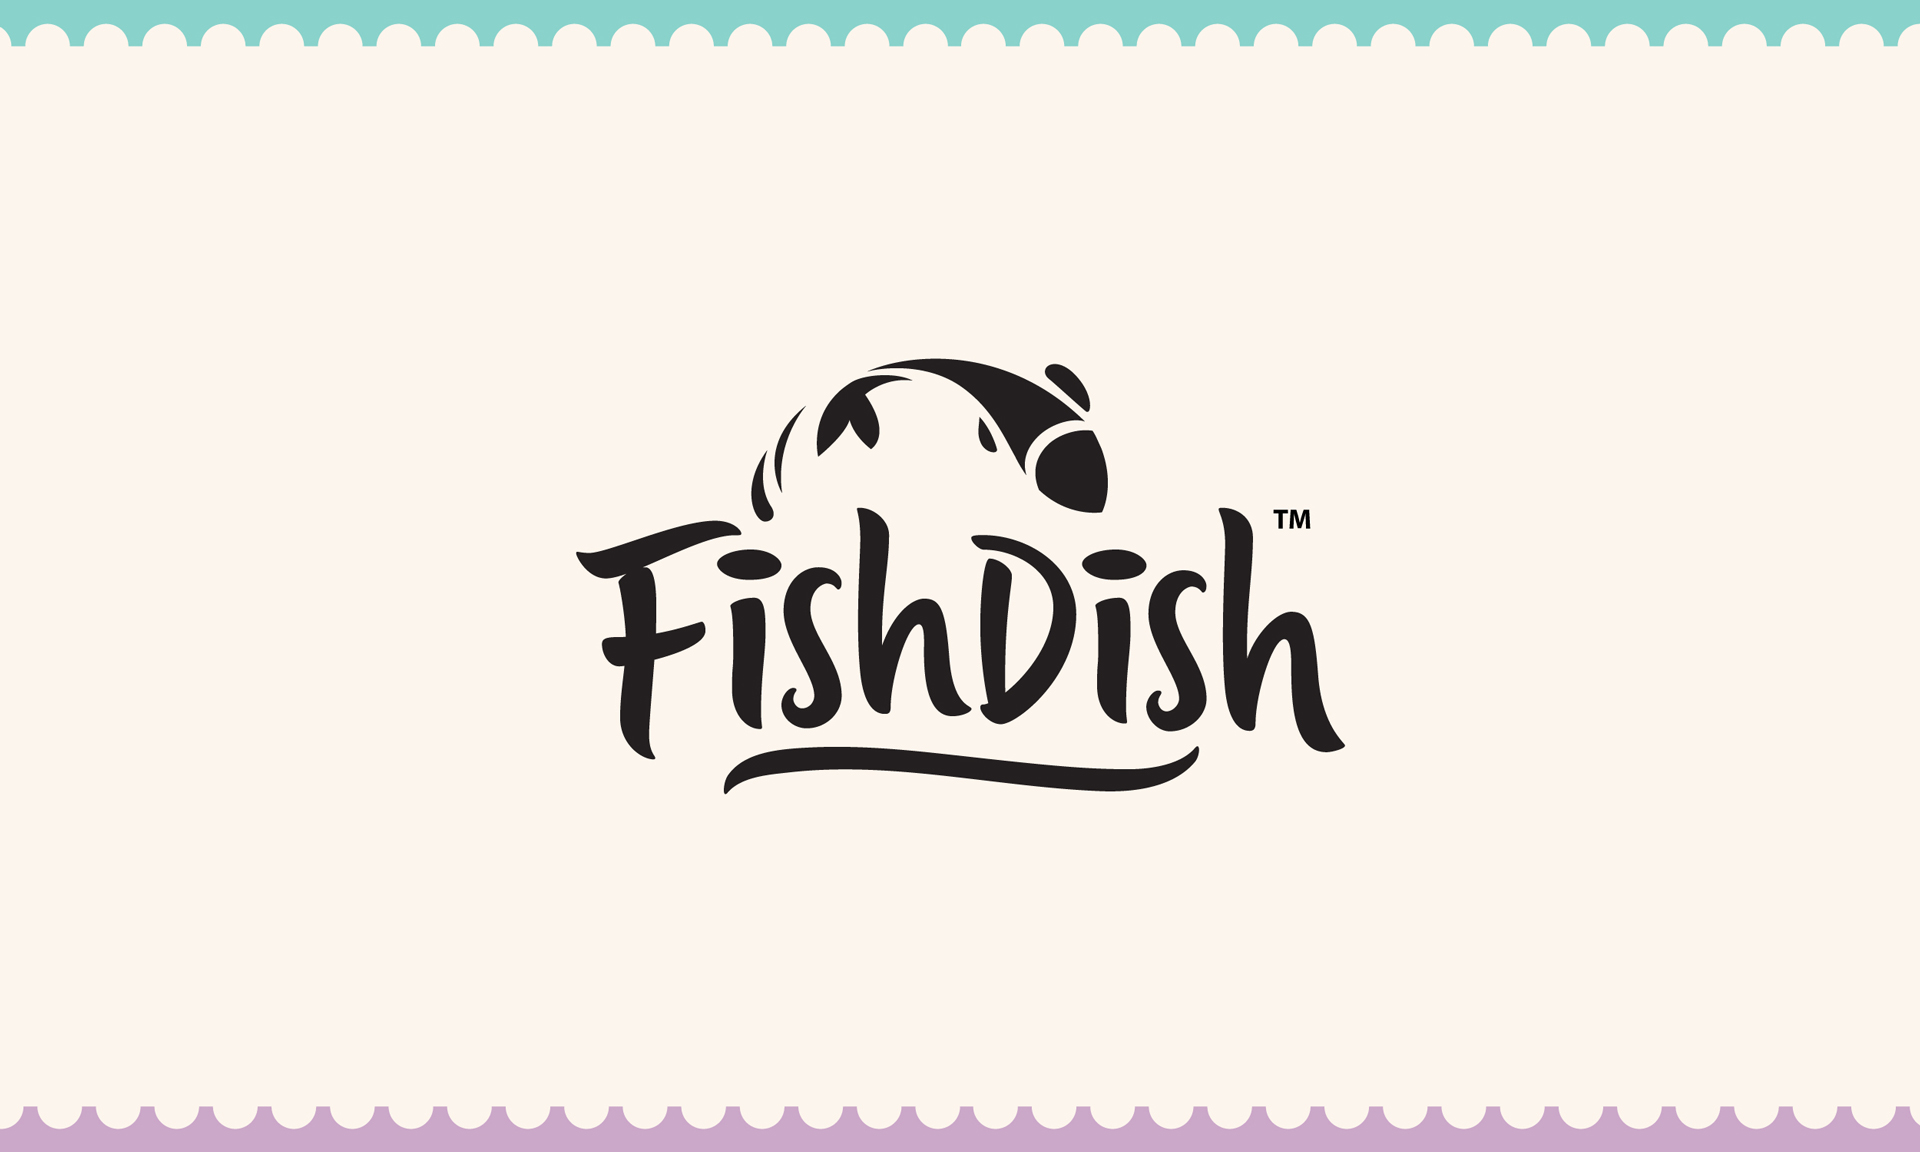 Cover image: FishDish